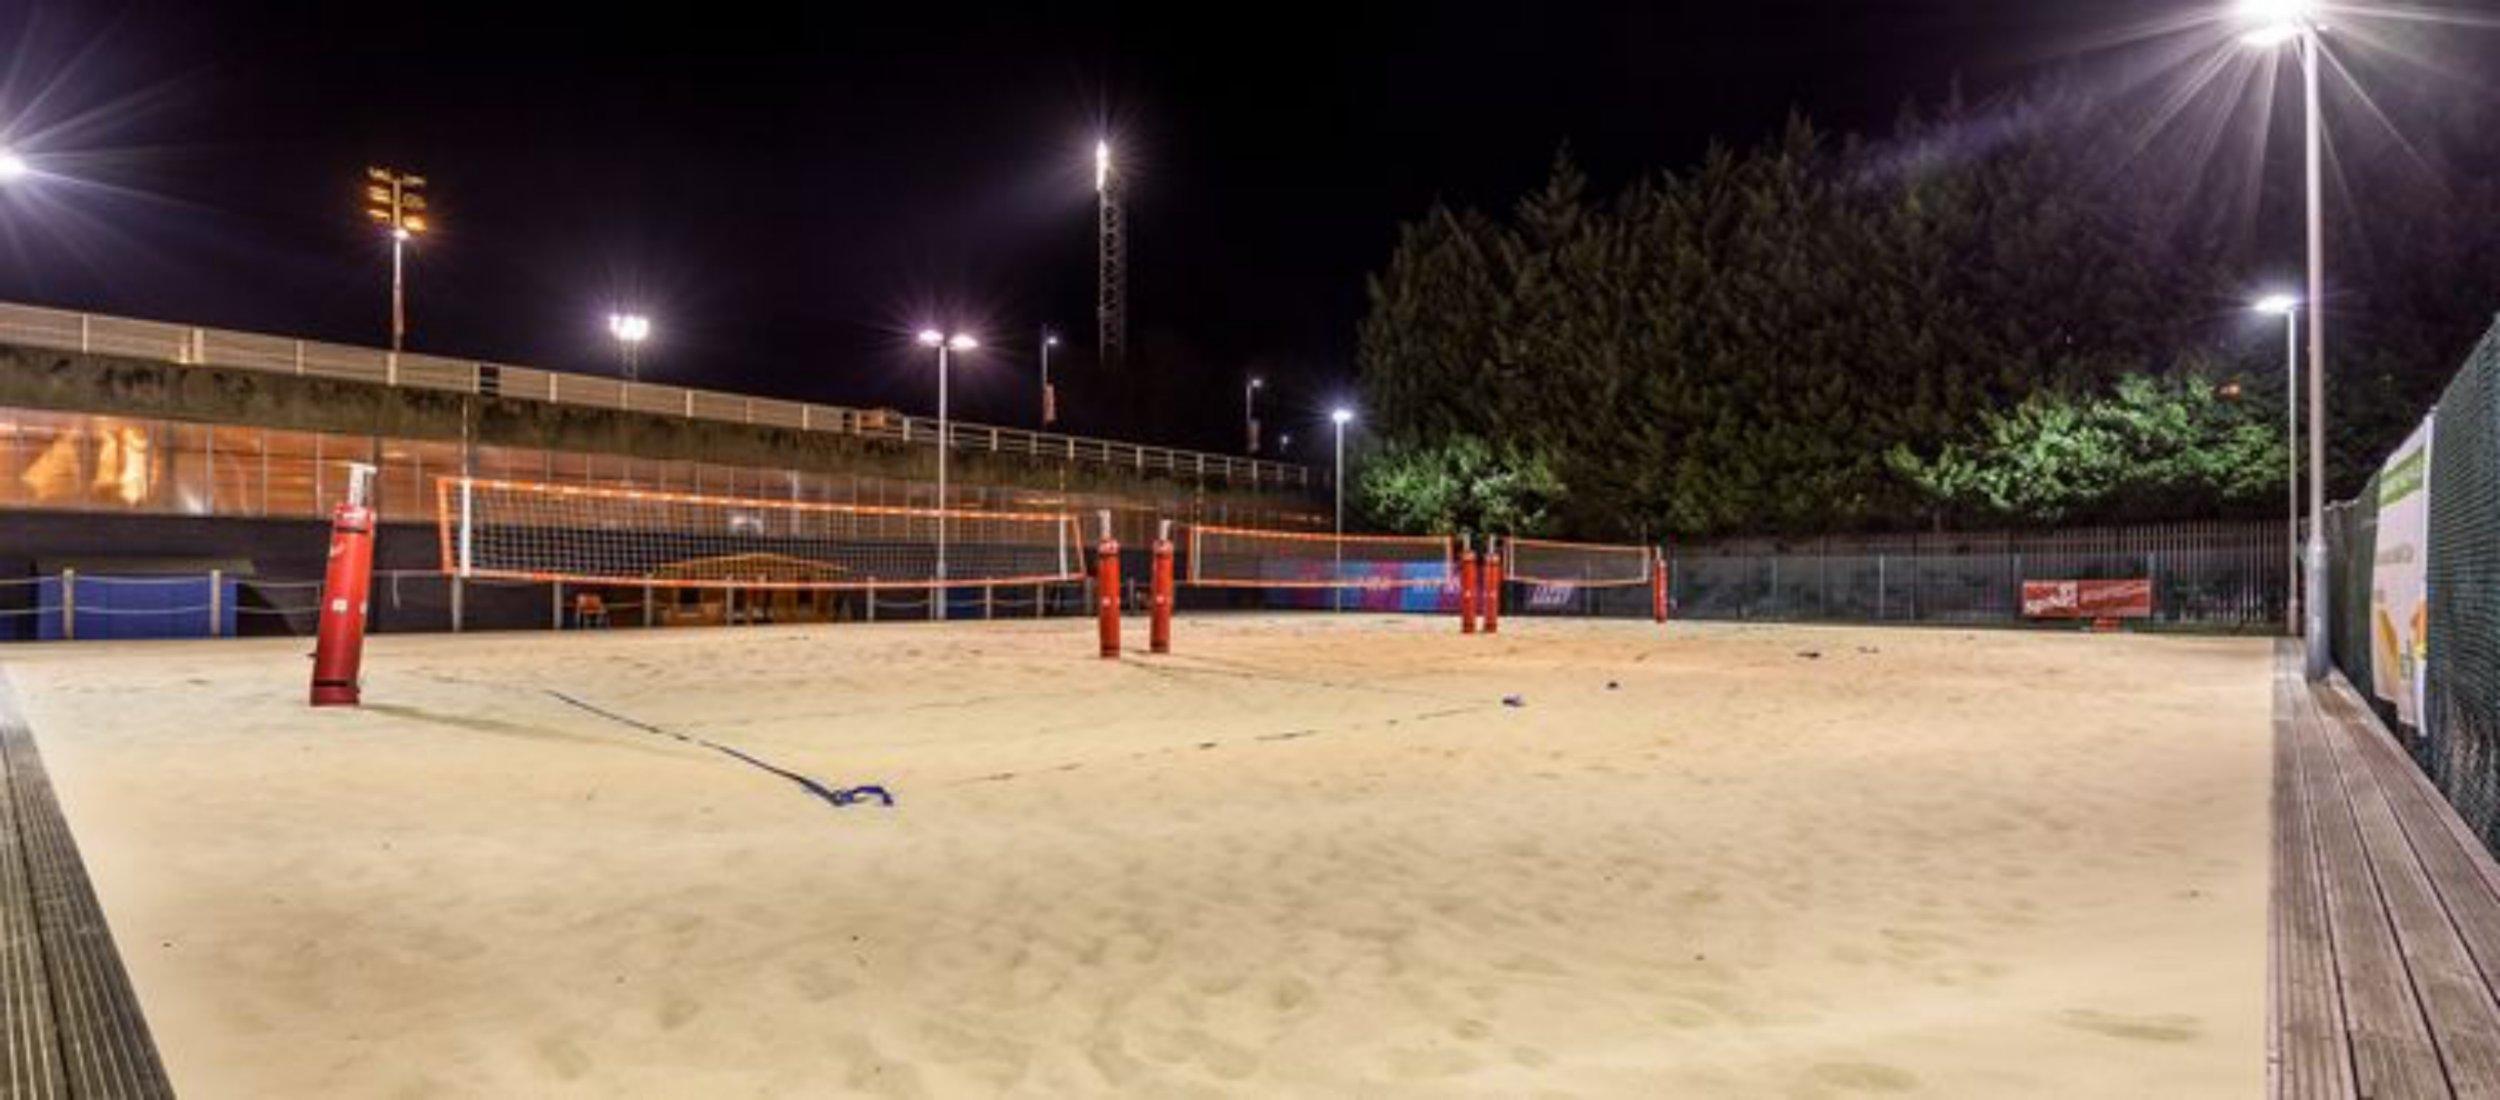 Beach volleyball 2.jpg